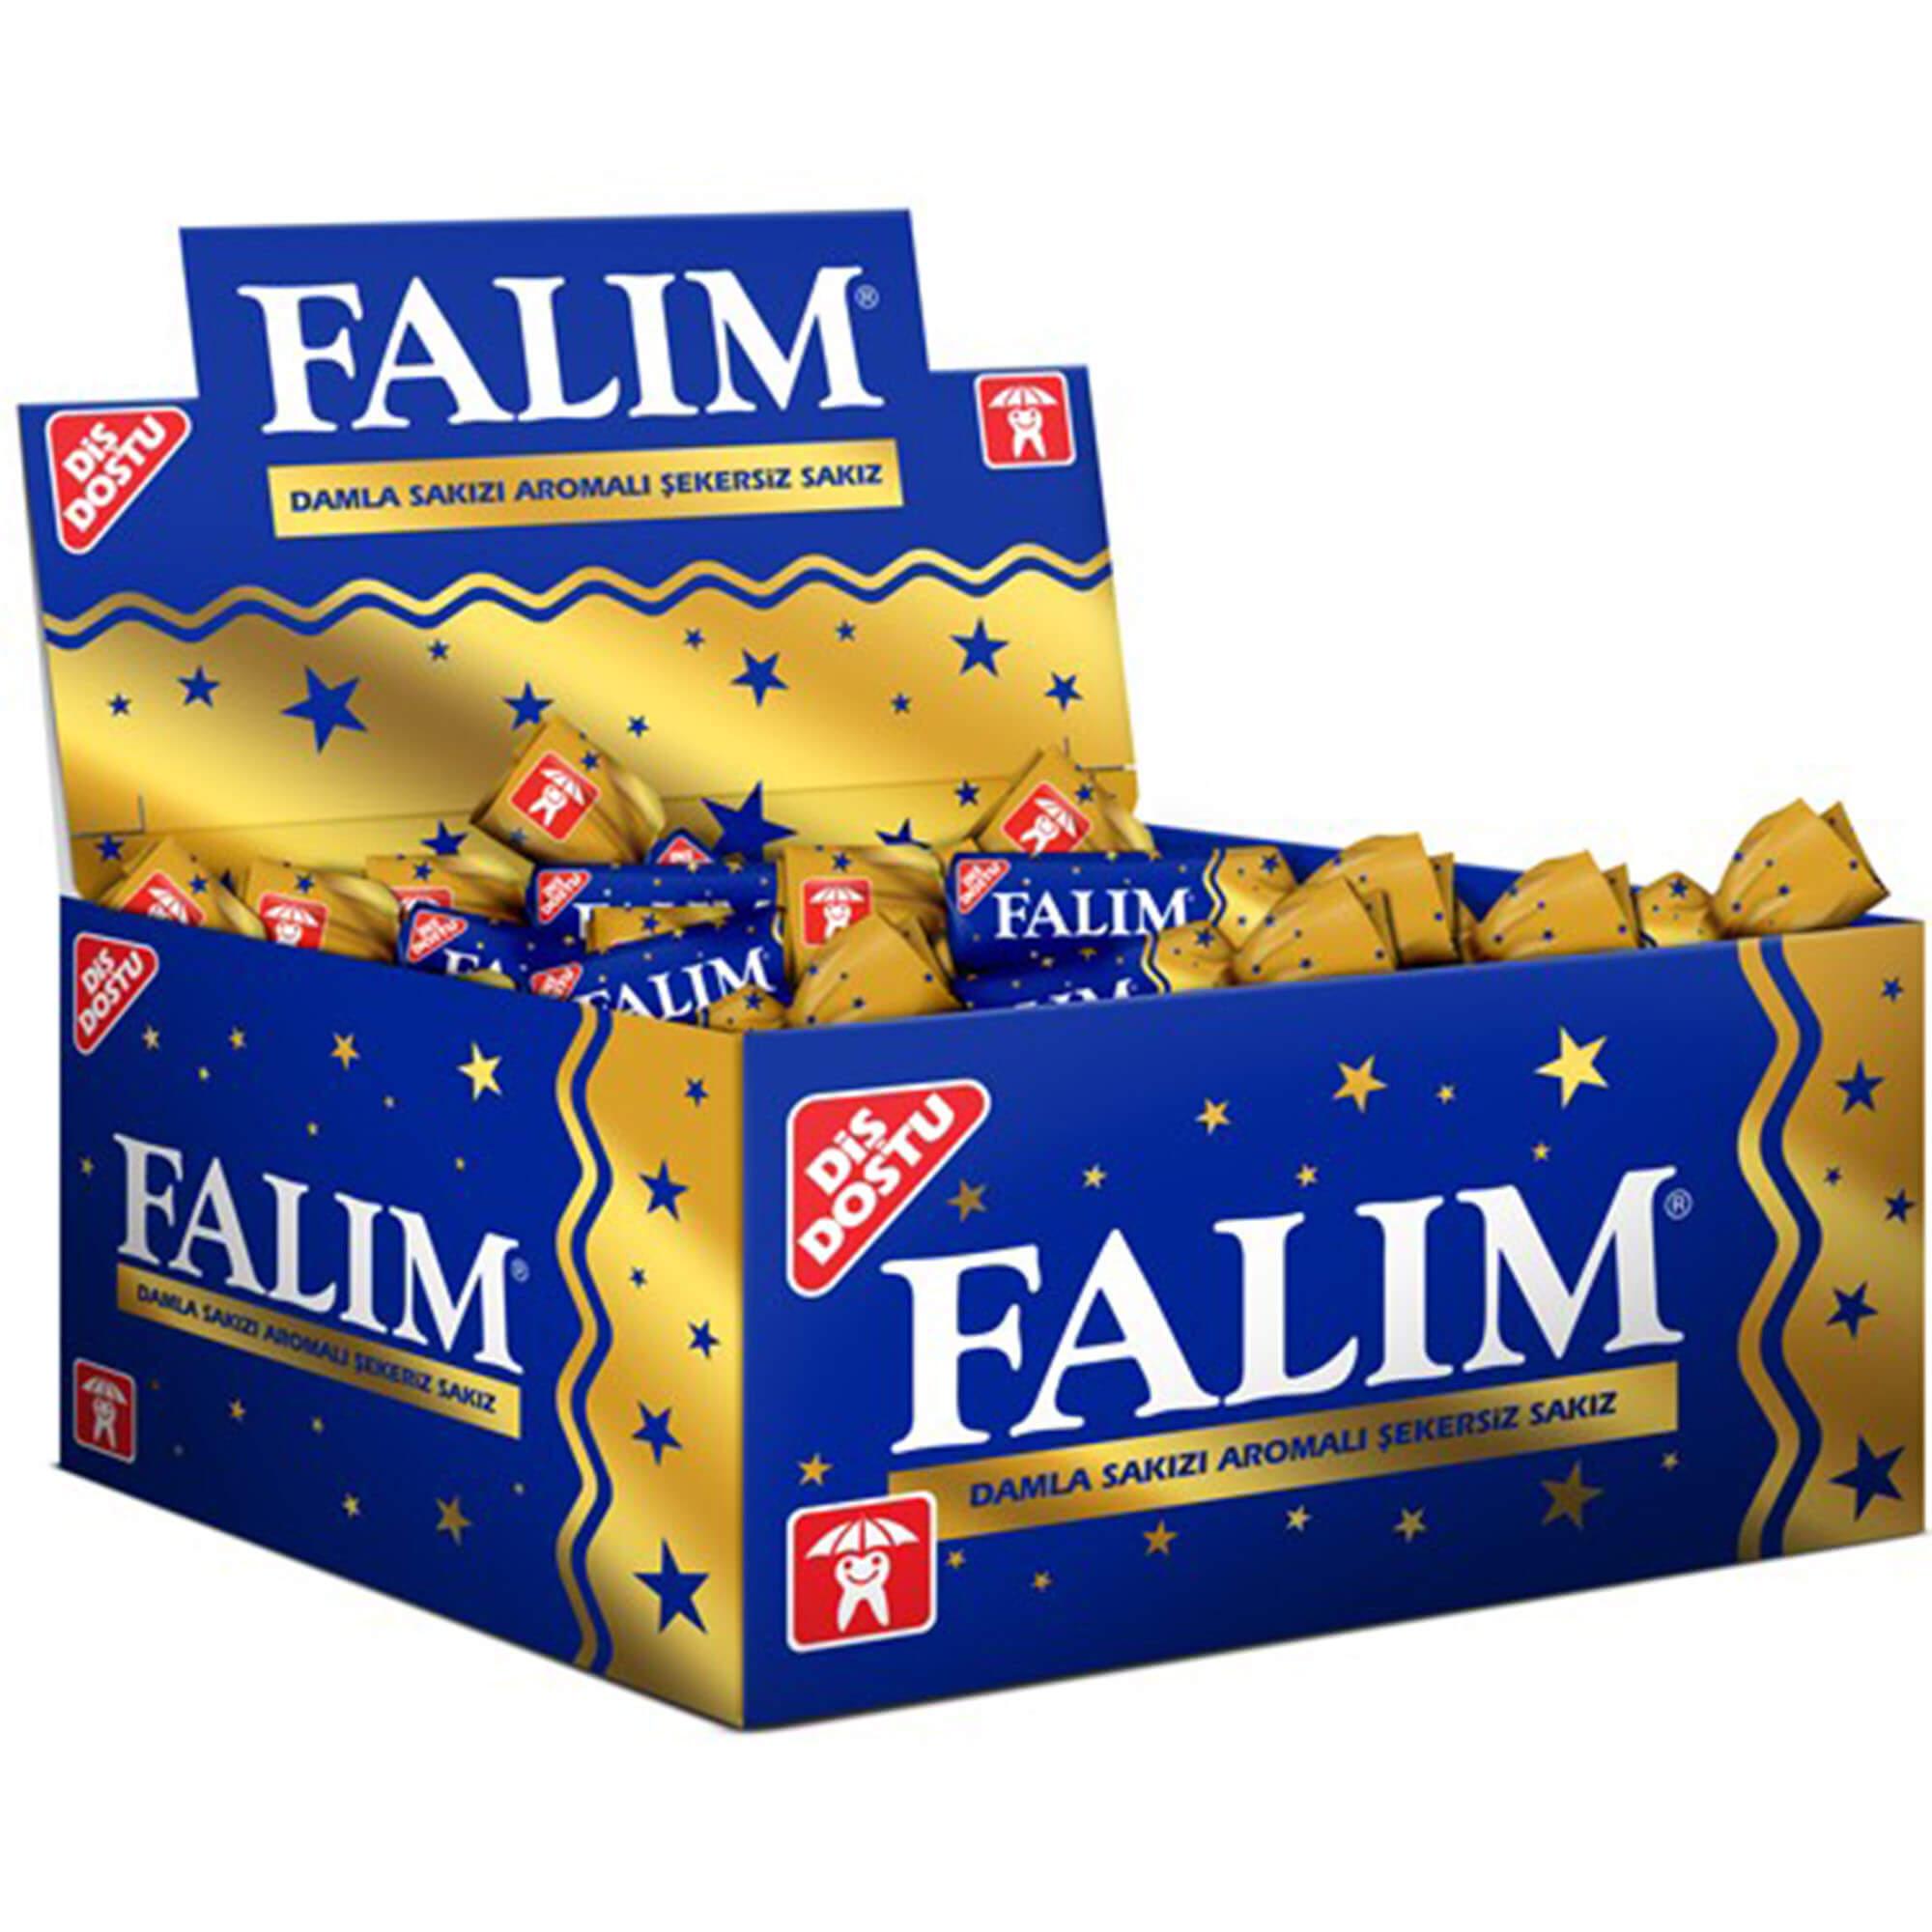 Falim мастика Ароматизированная без сахара камедь 100 штук бесплатно SHİPPİNG